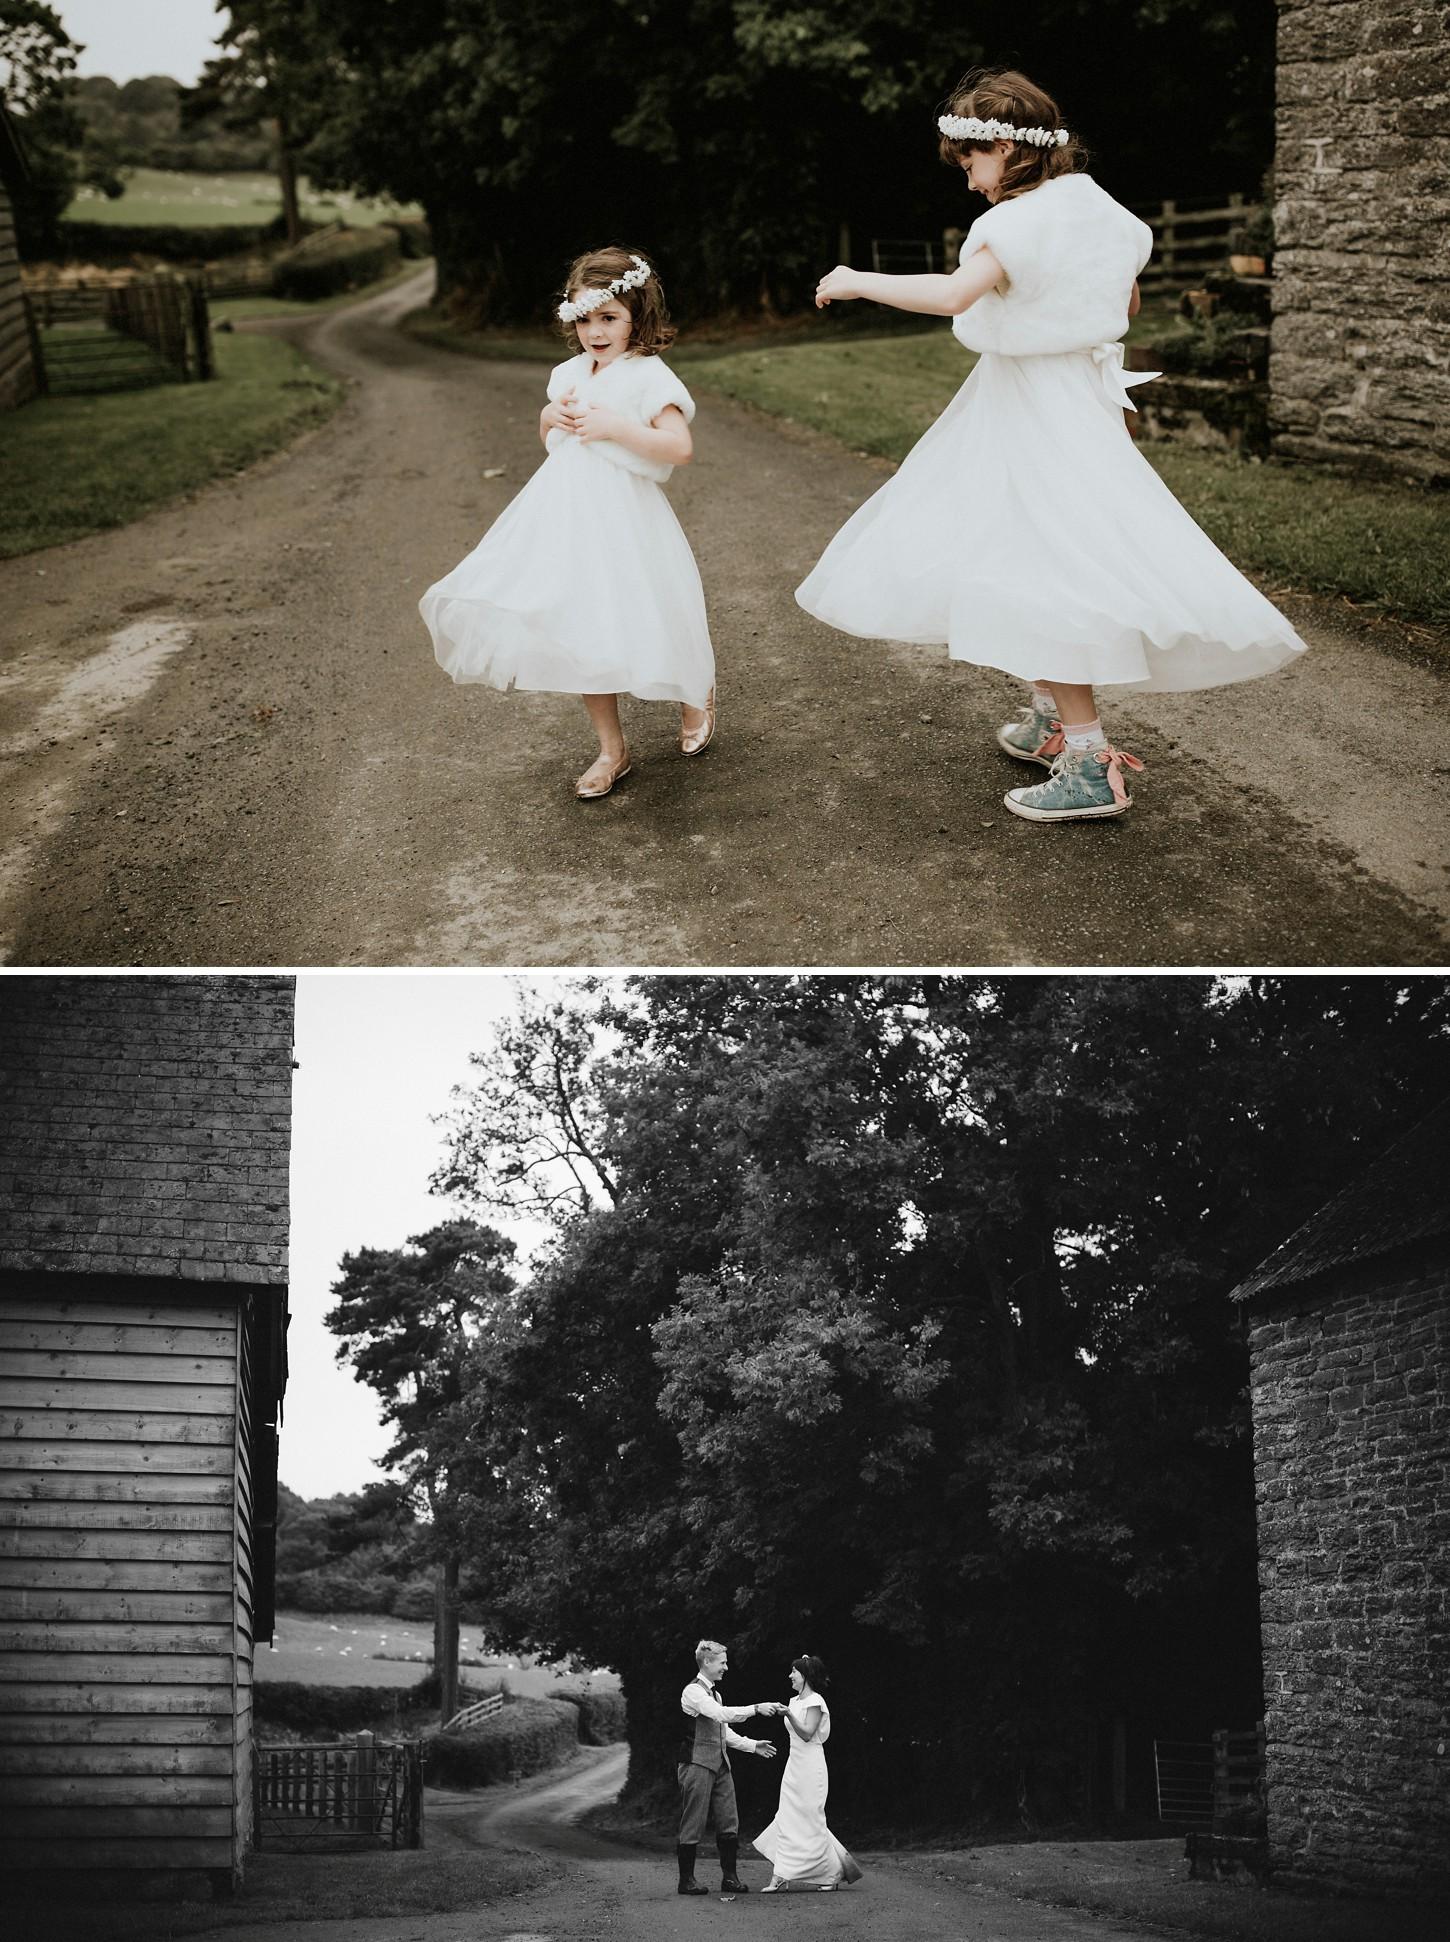 Dolau-Sheep-Farm-Wedding-Wales-United-Kingdom-064